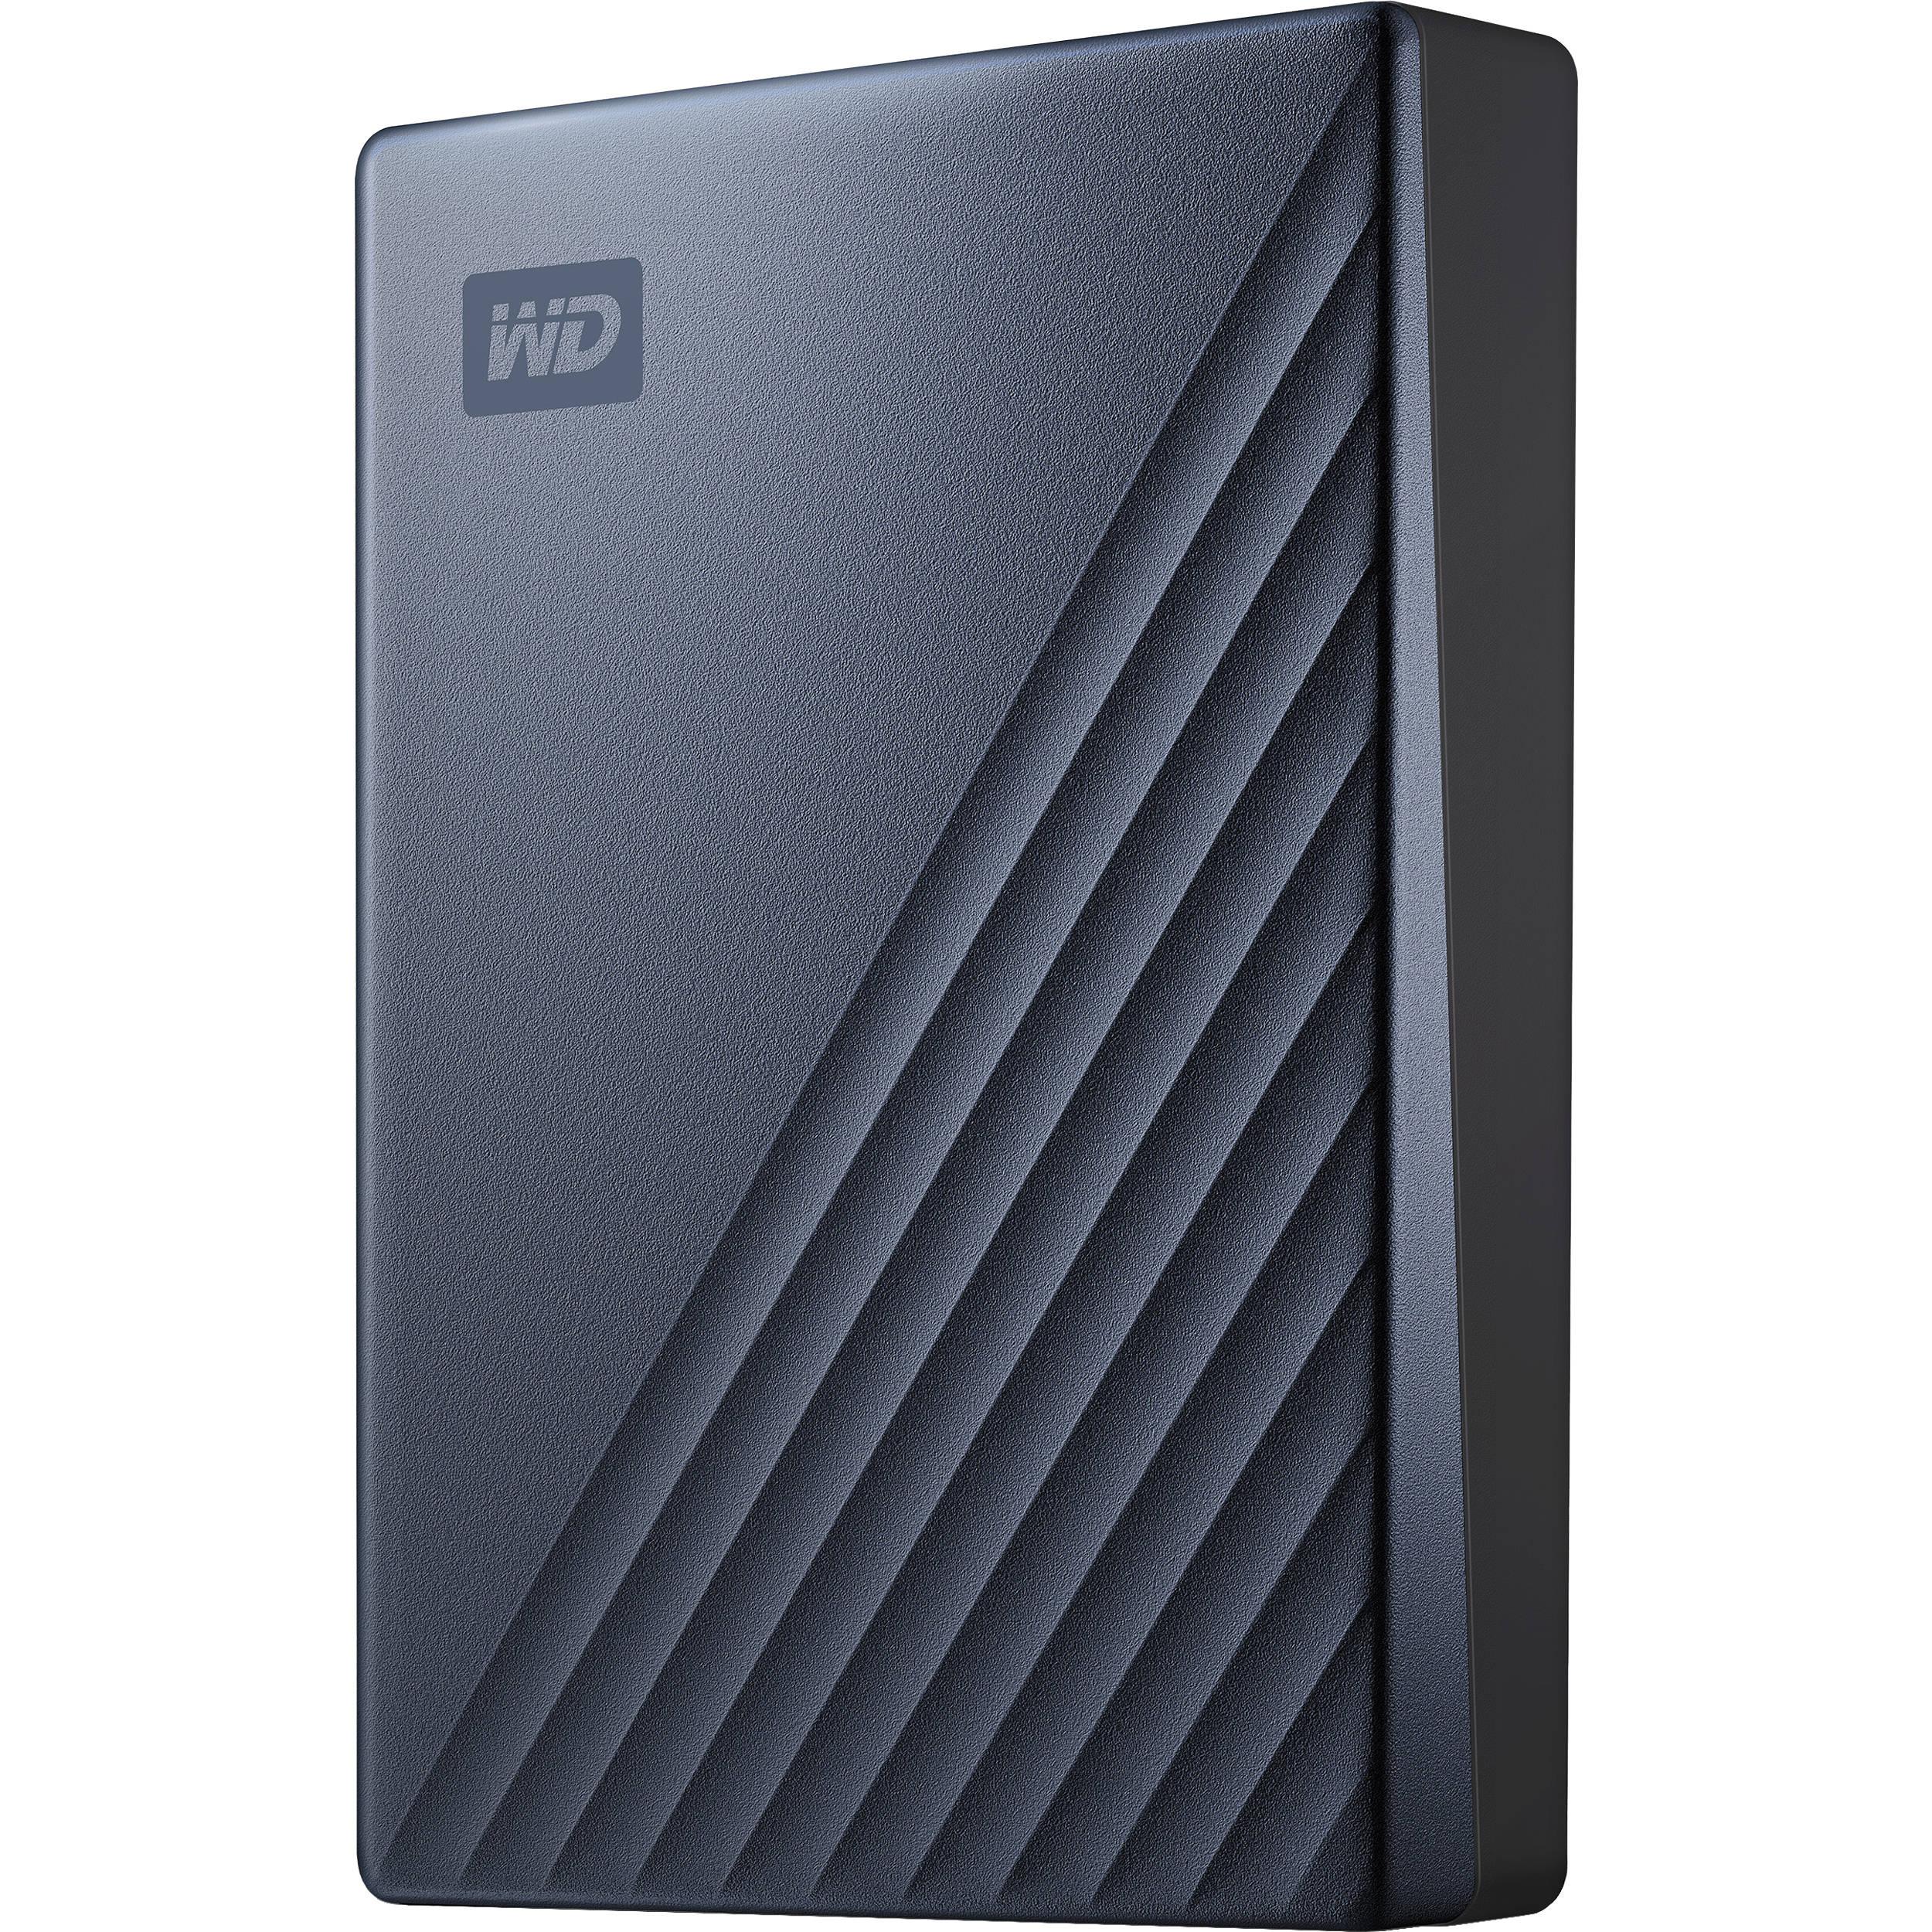 WD 4TB My Passport Ultra USB 3 0 Type-C External Hard Drive (Blue)